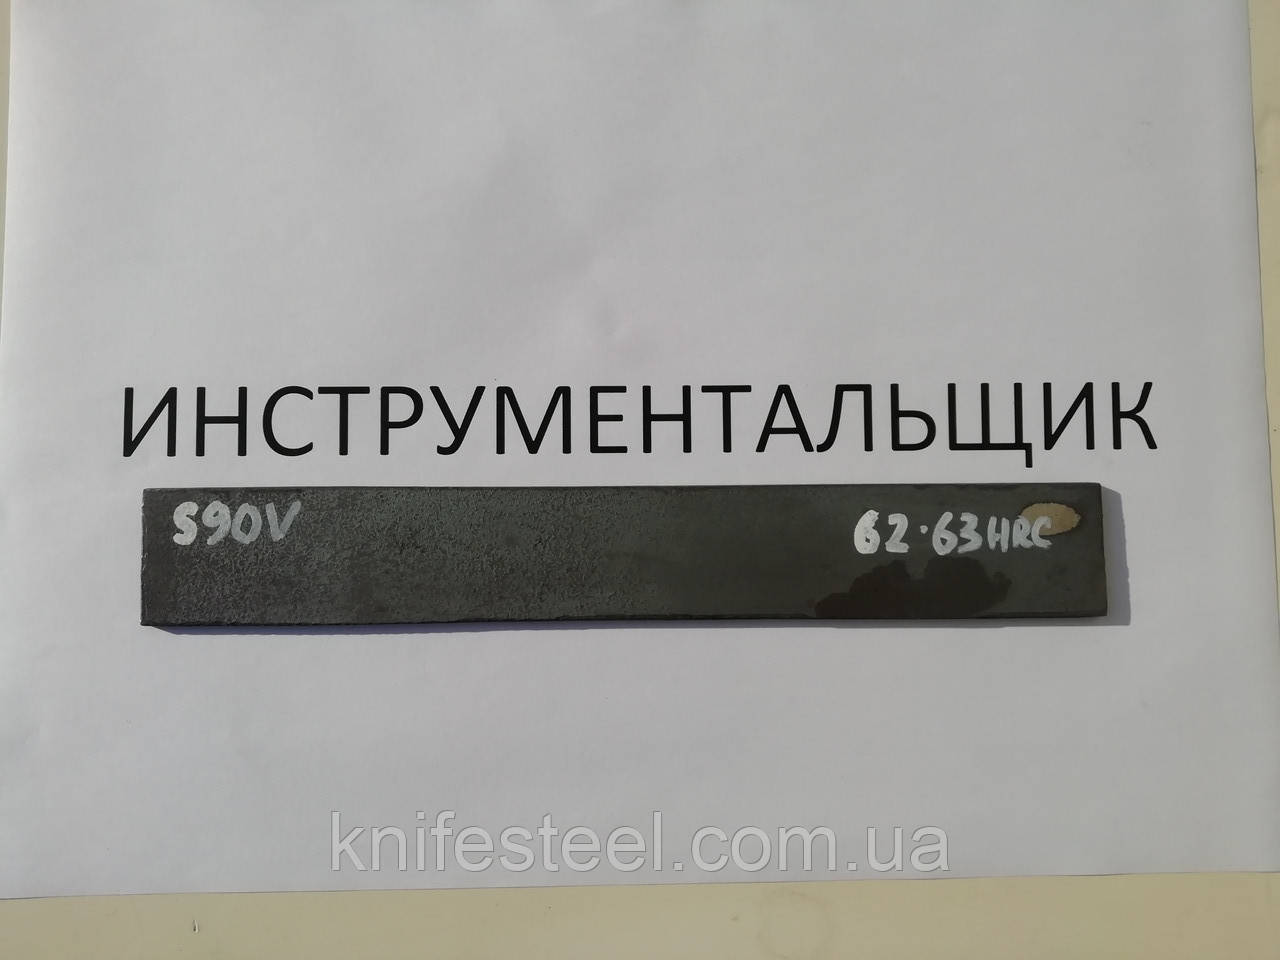 Заготовка для ножа сталь CPM S90V 128х41х4,7 мм термообработка (62-63 HRC)